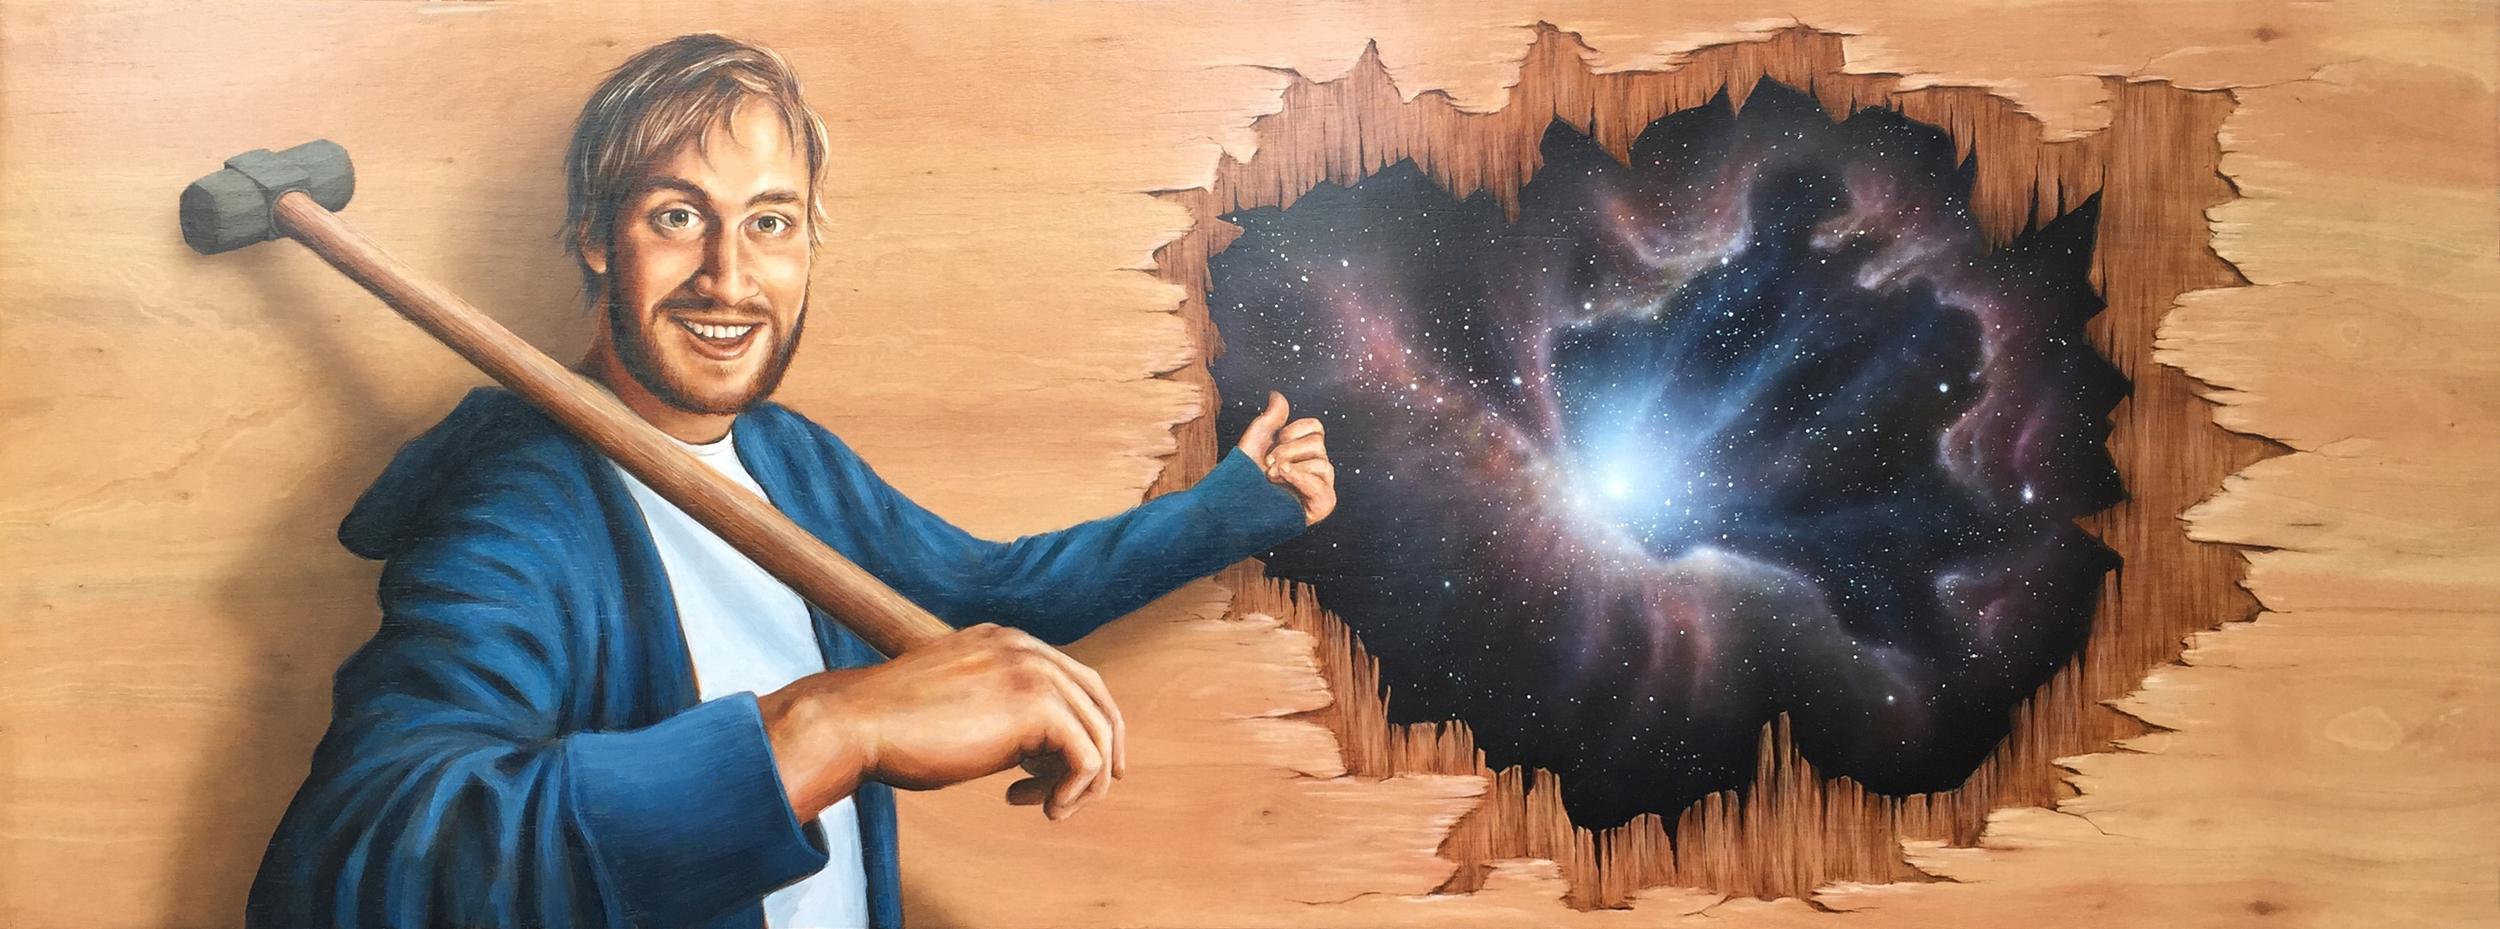 'Through the Wall' Oil on Board (90 x 250cm)